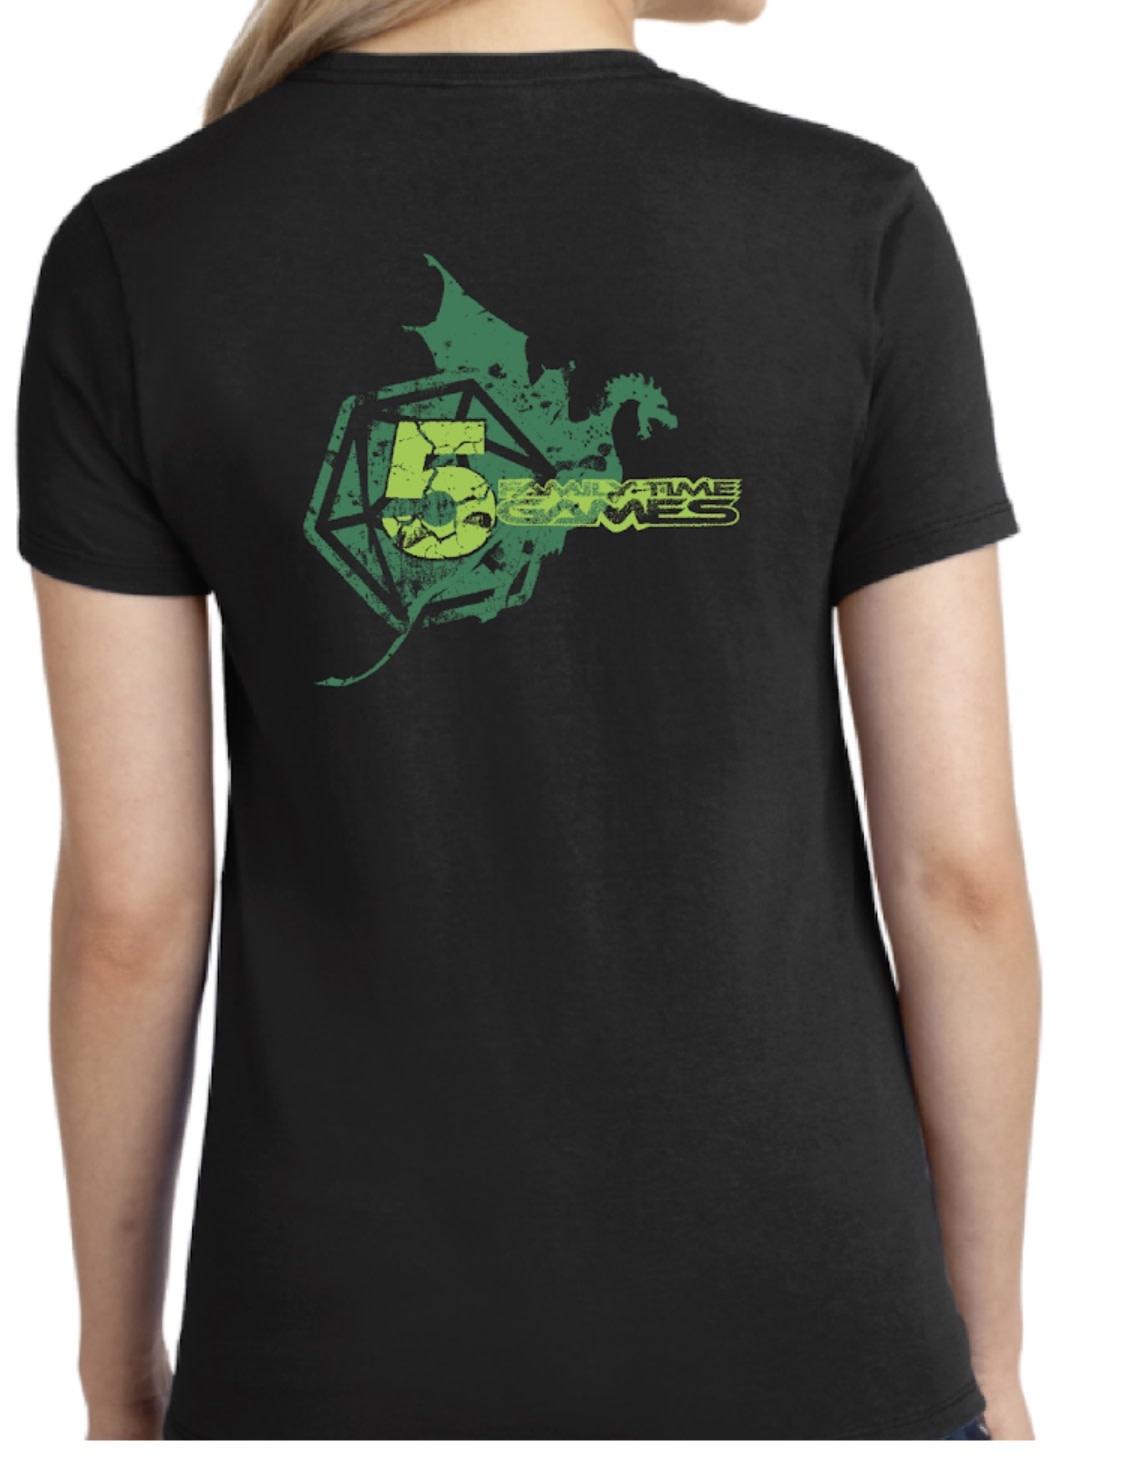 Team image 5 year Anniversary short sleeves shirt woman (size XL)